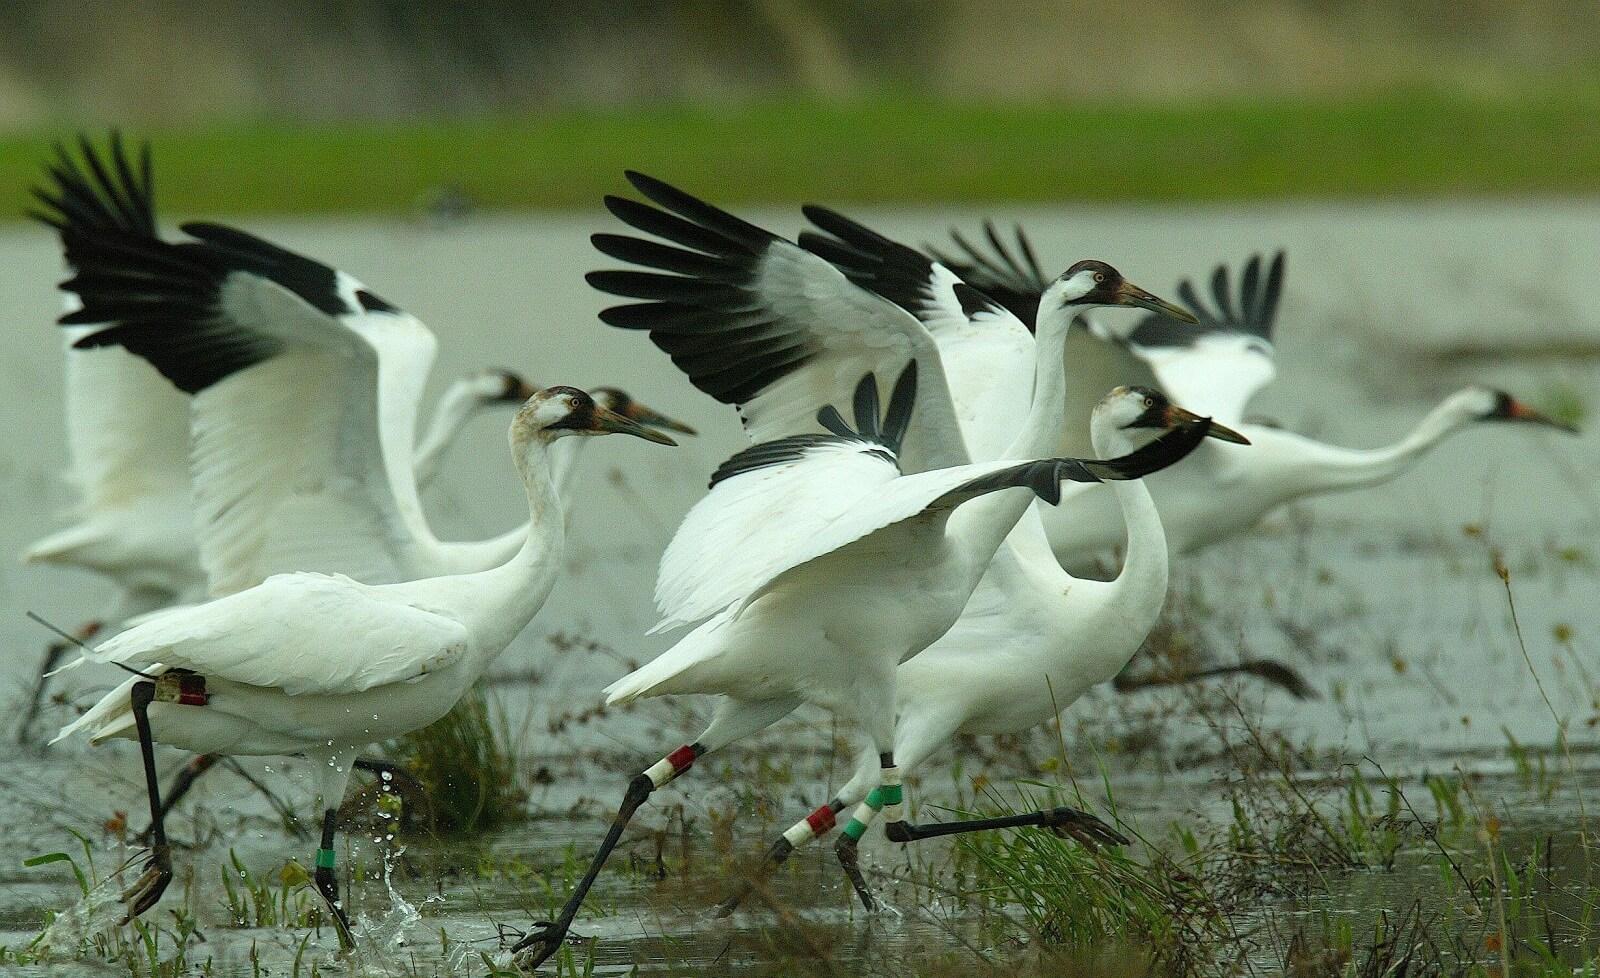 Sultanpur National Park and Bird Sanctuaries